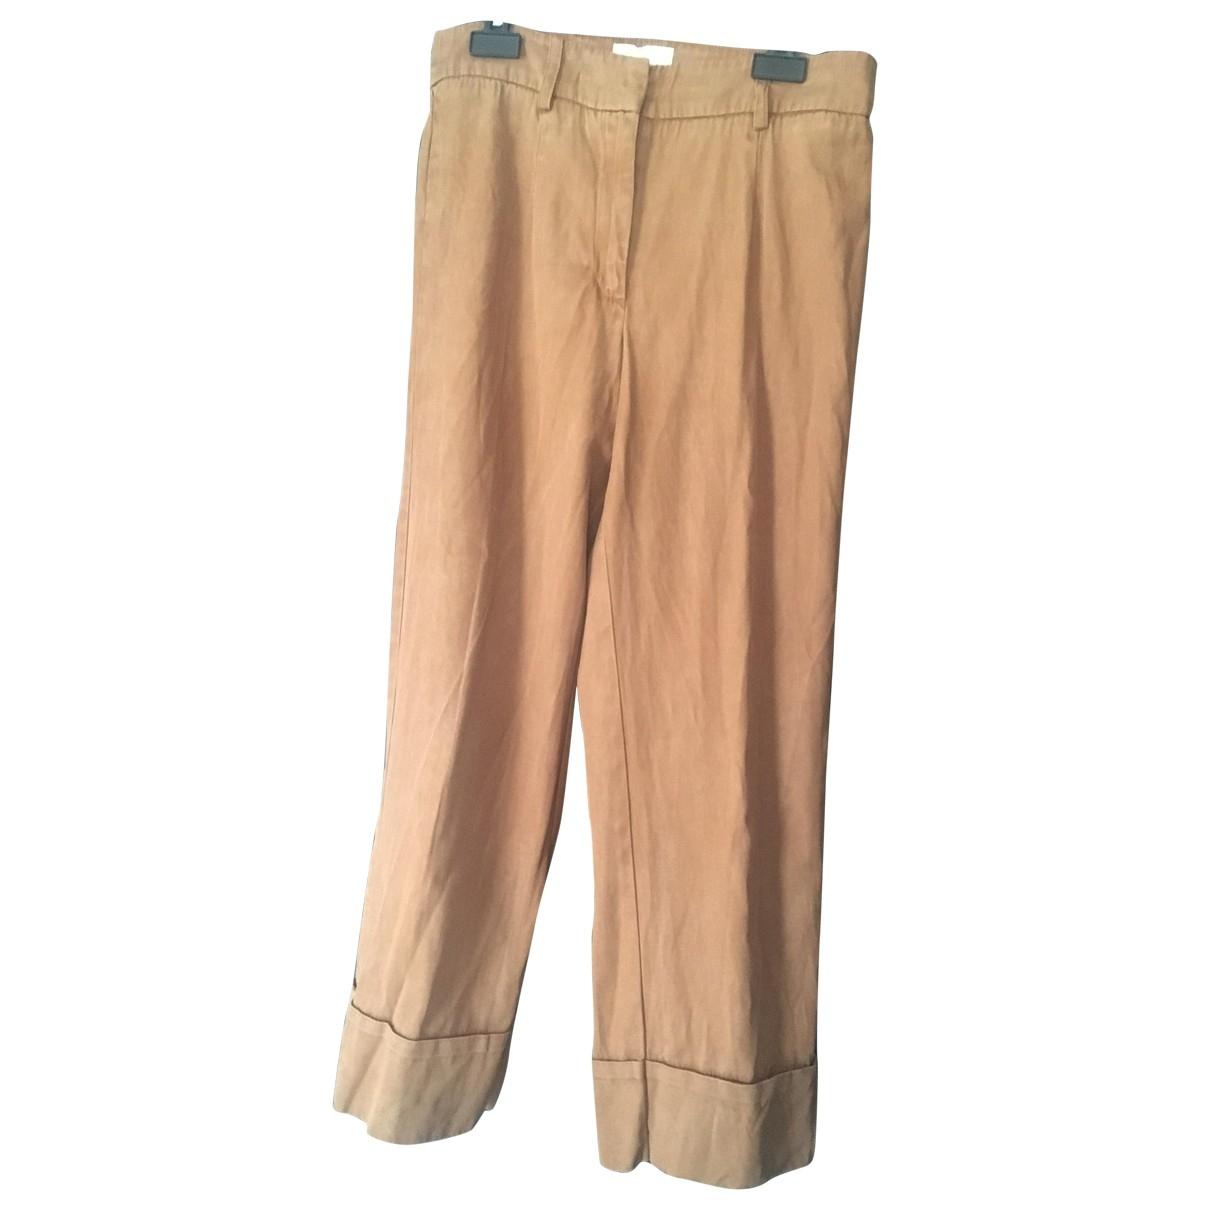 Sézane \N Camel Cotton Trousers for Women 34 FR